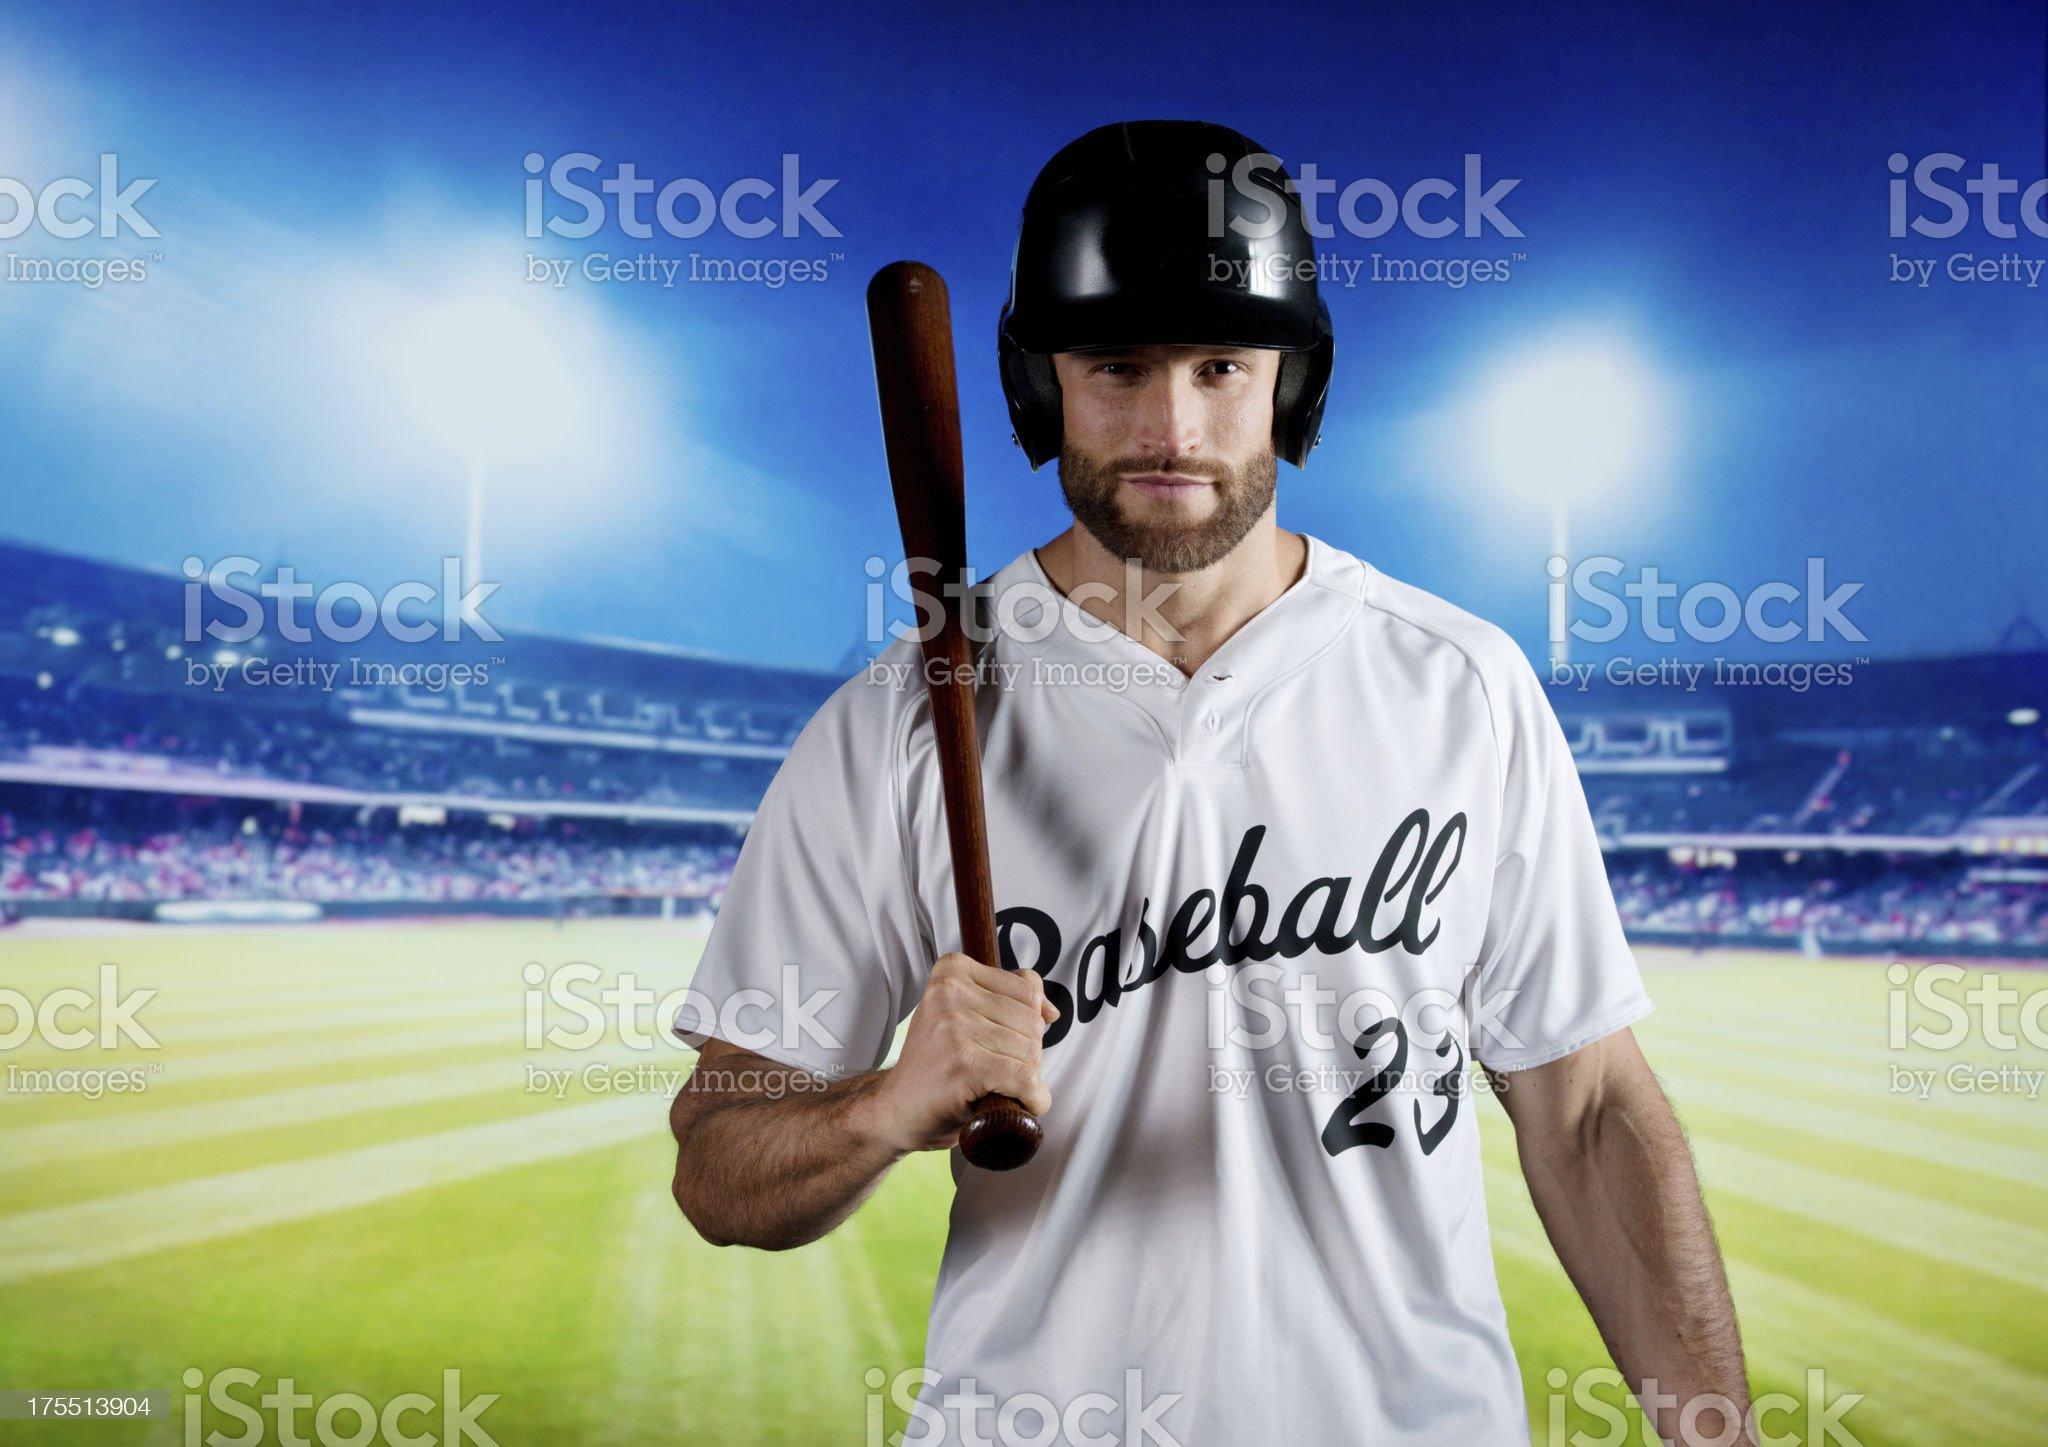 Baseball player on playground royalty-free stock photo